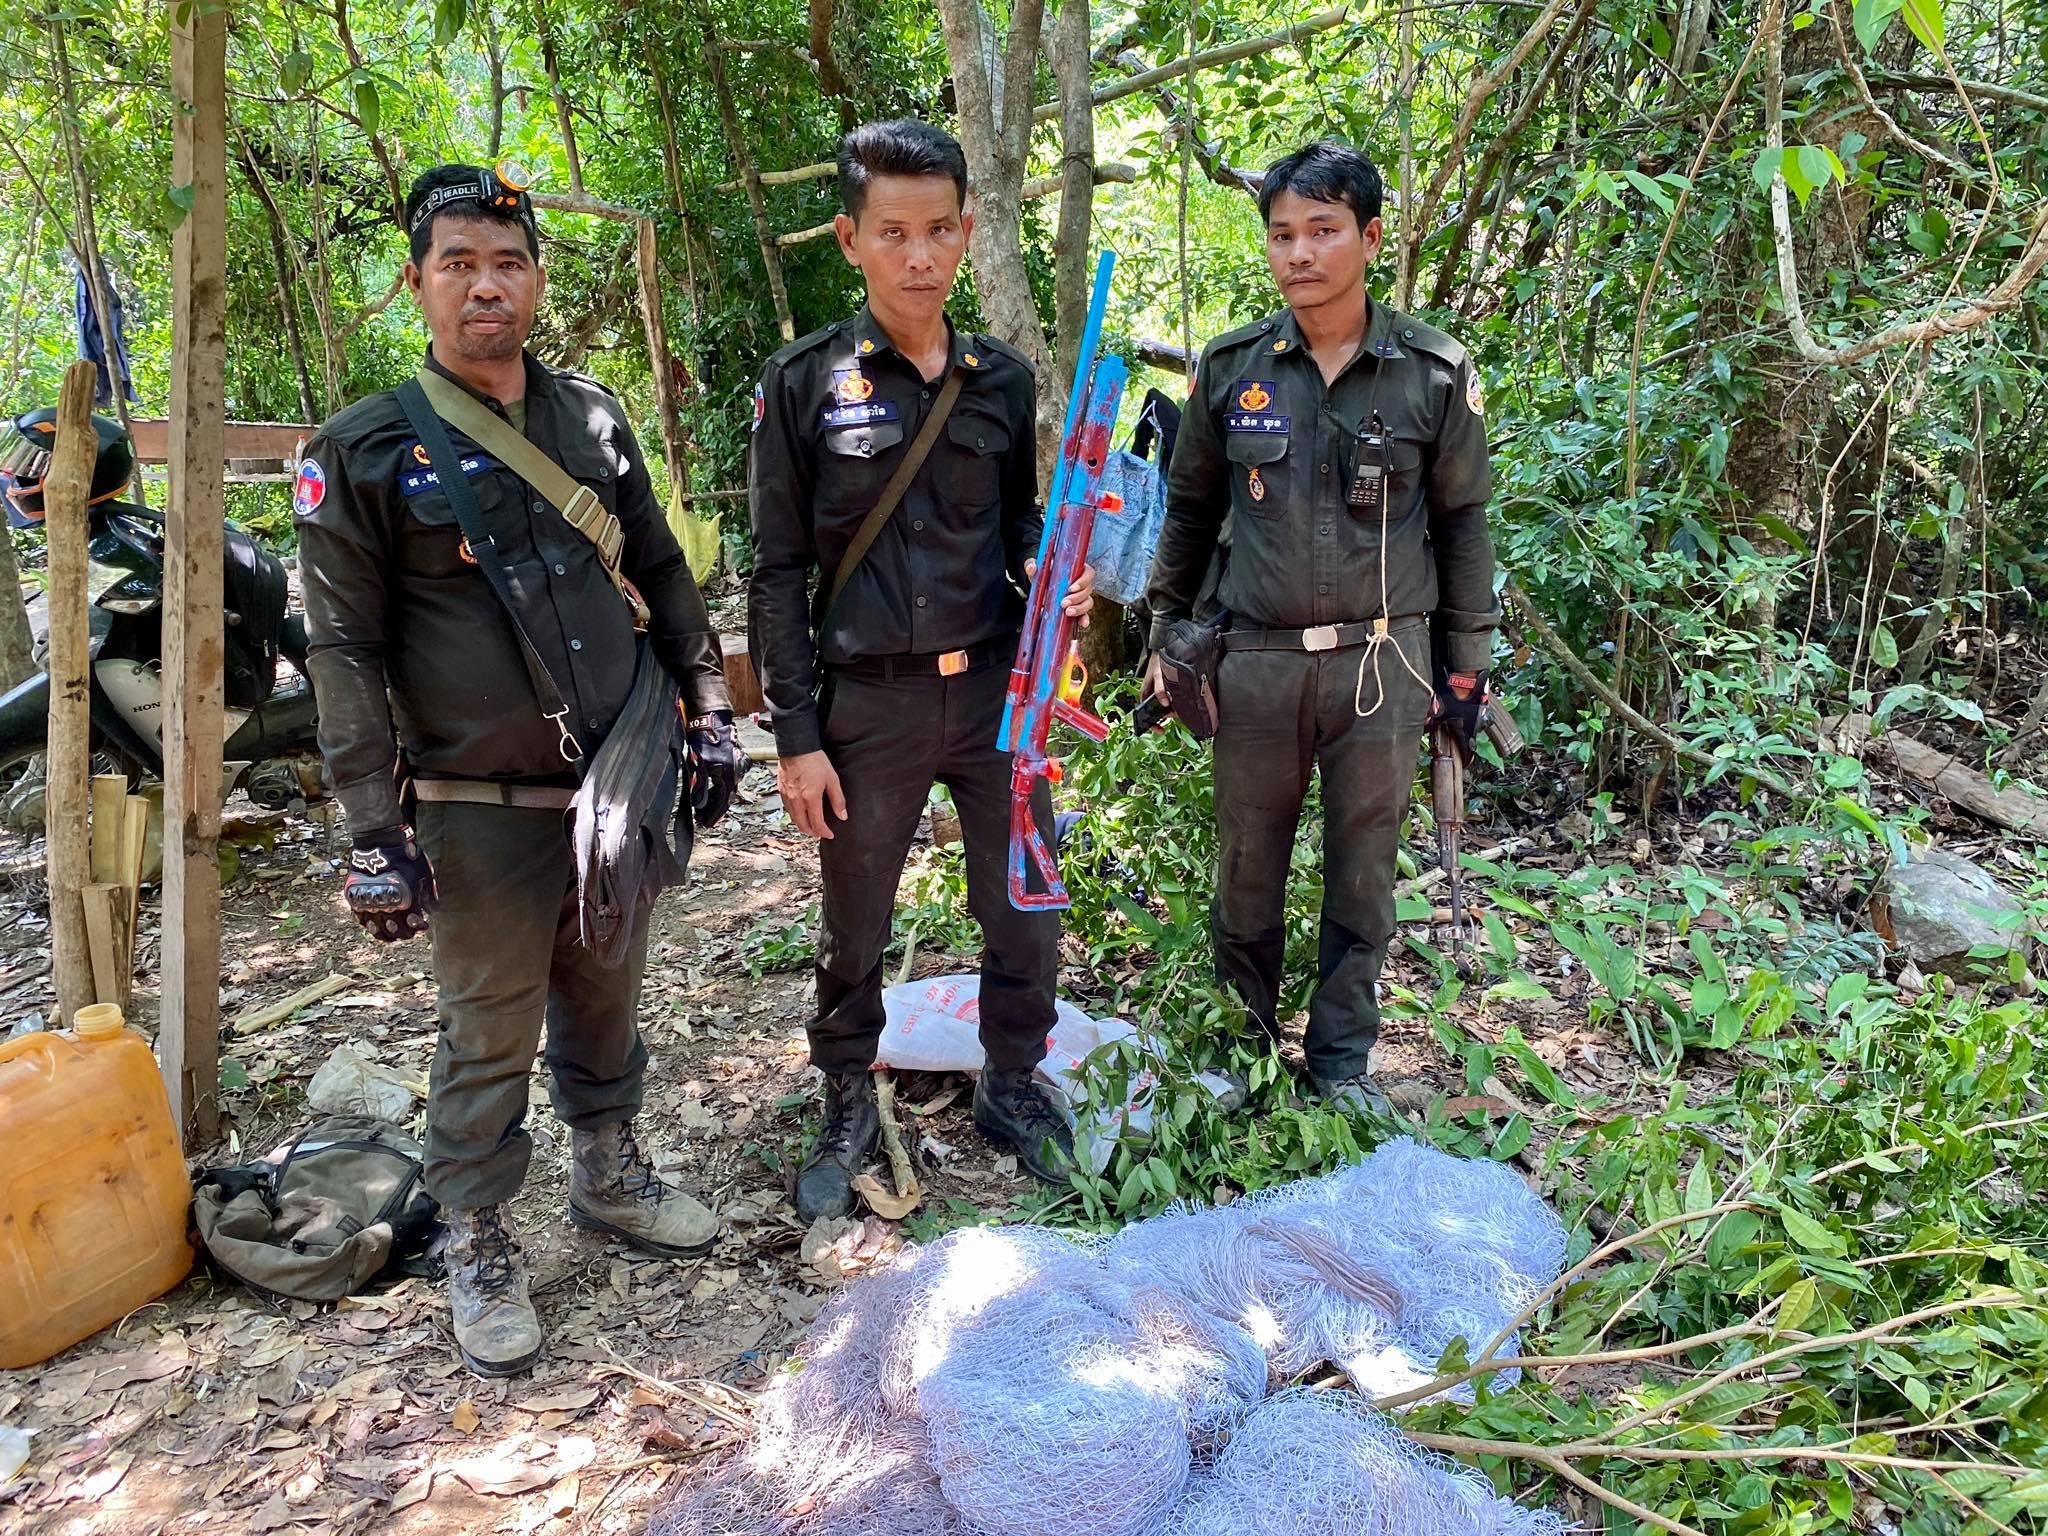 Poachers use new gun design